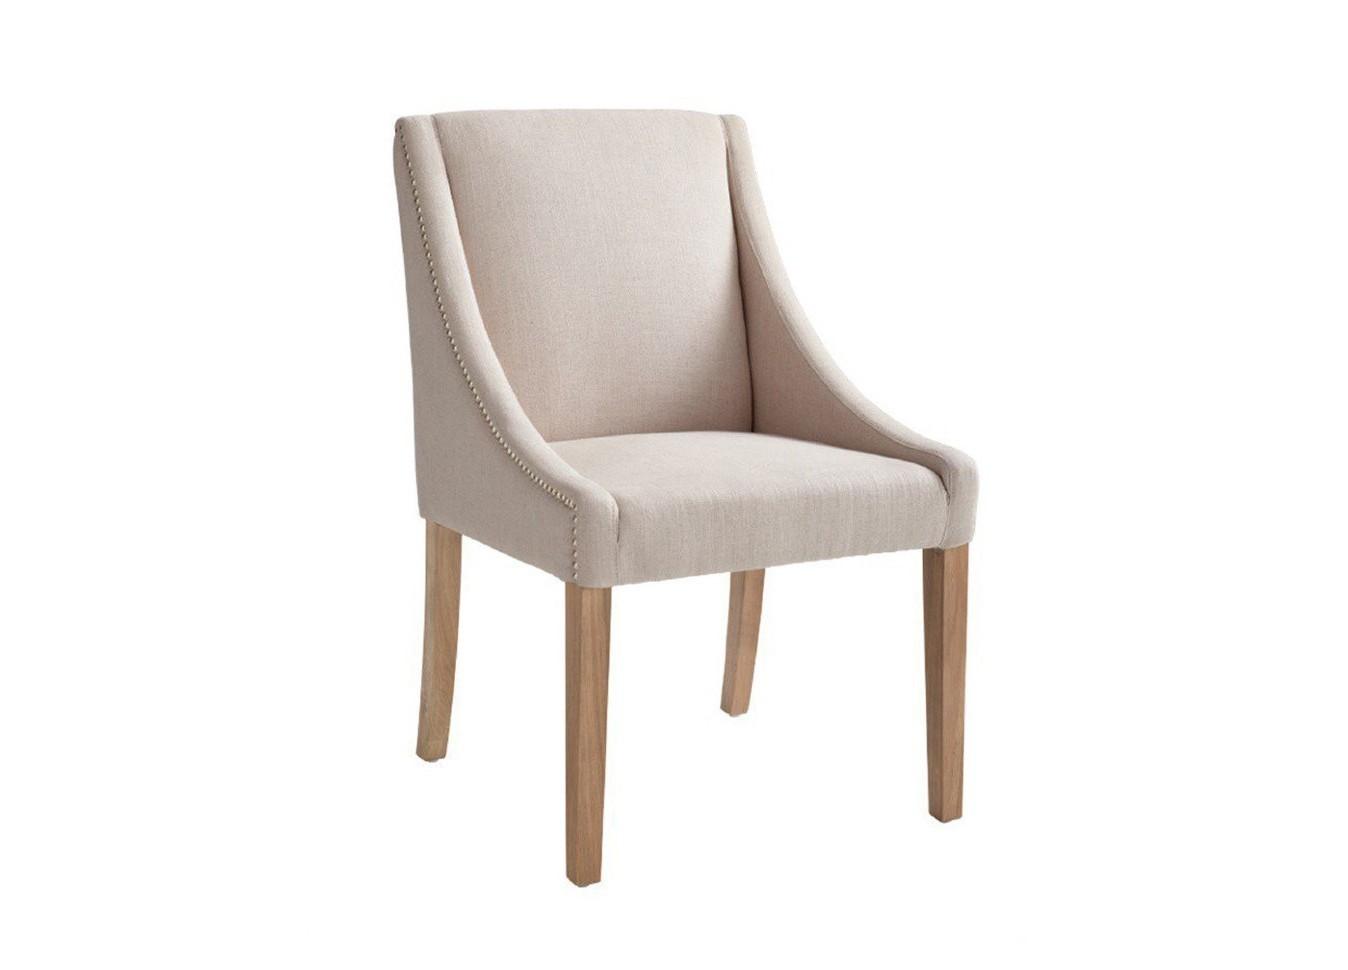 Кухонный стул Icon Designe 15435549 от thefurnish